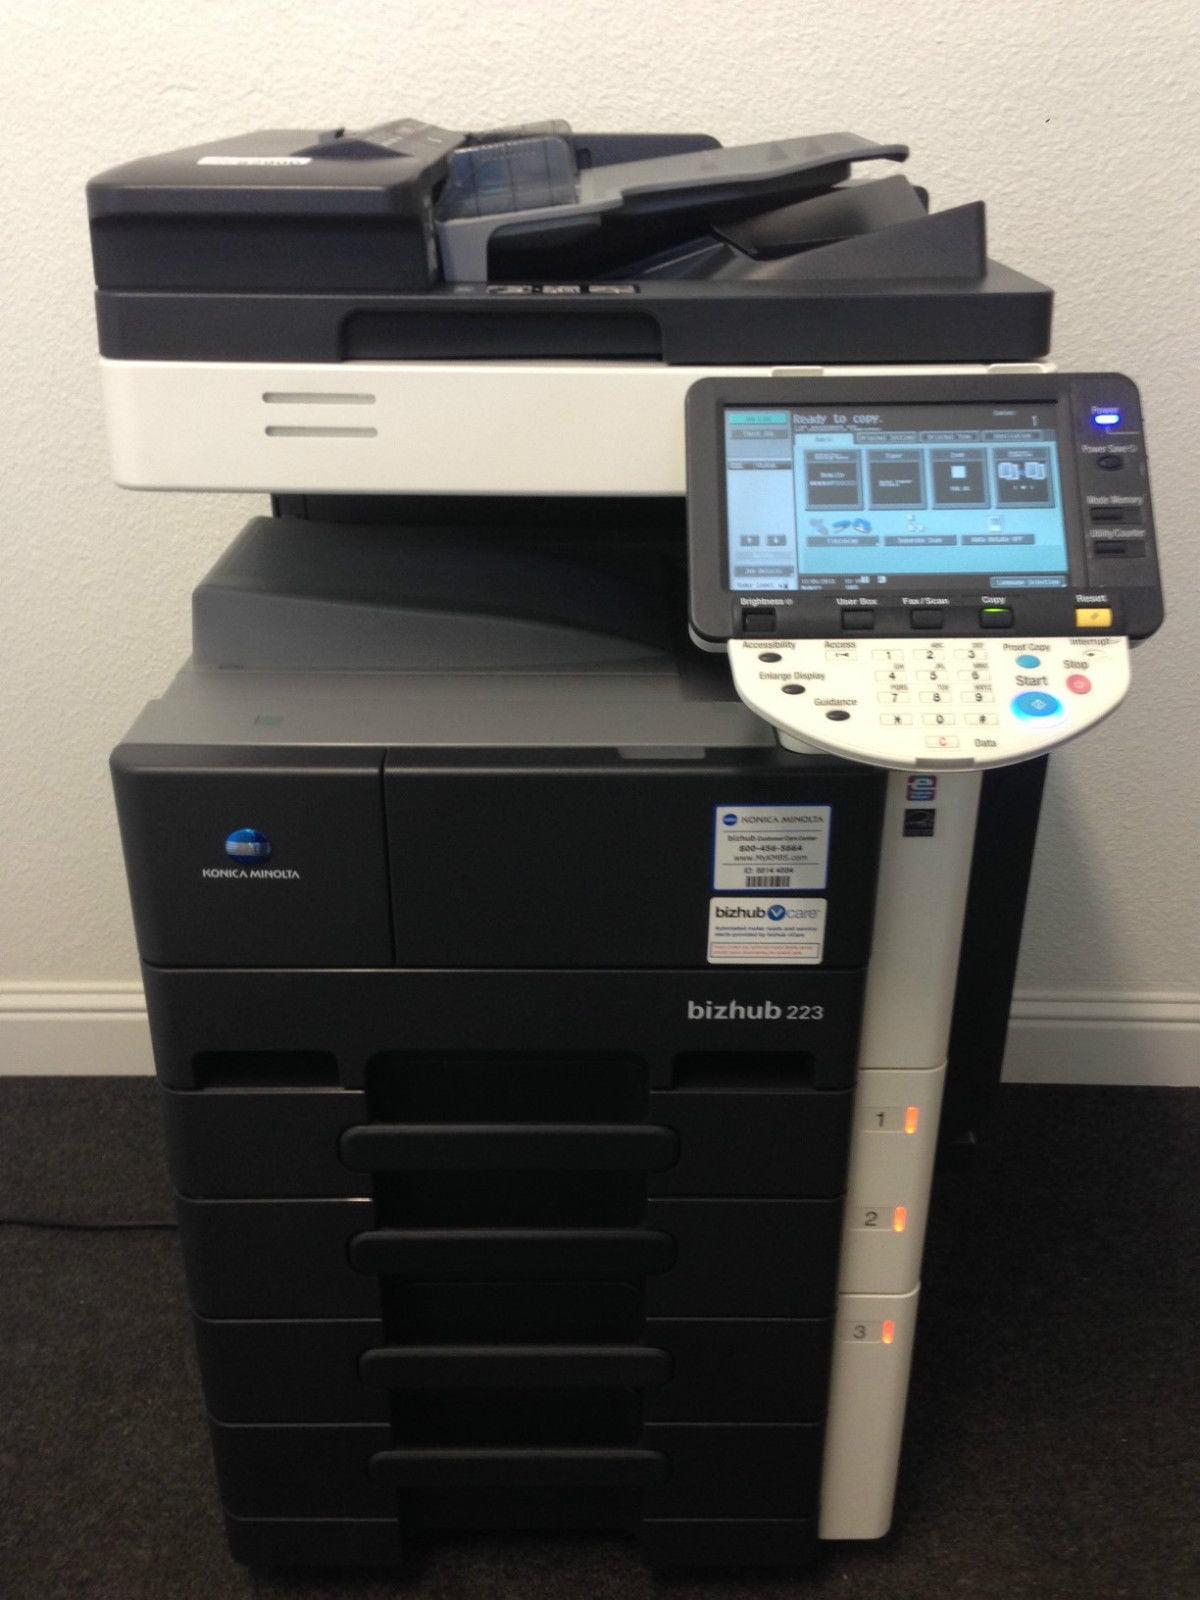 Konica Minolta Bizhub 223 Copier Printer Scanner USB & FREE SHIPPING inside USA by Konica Minolta